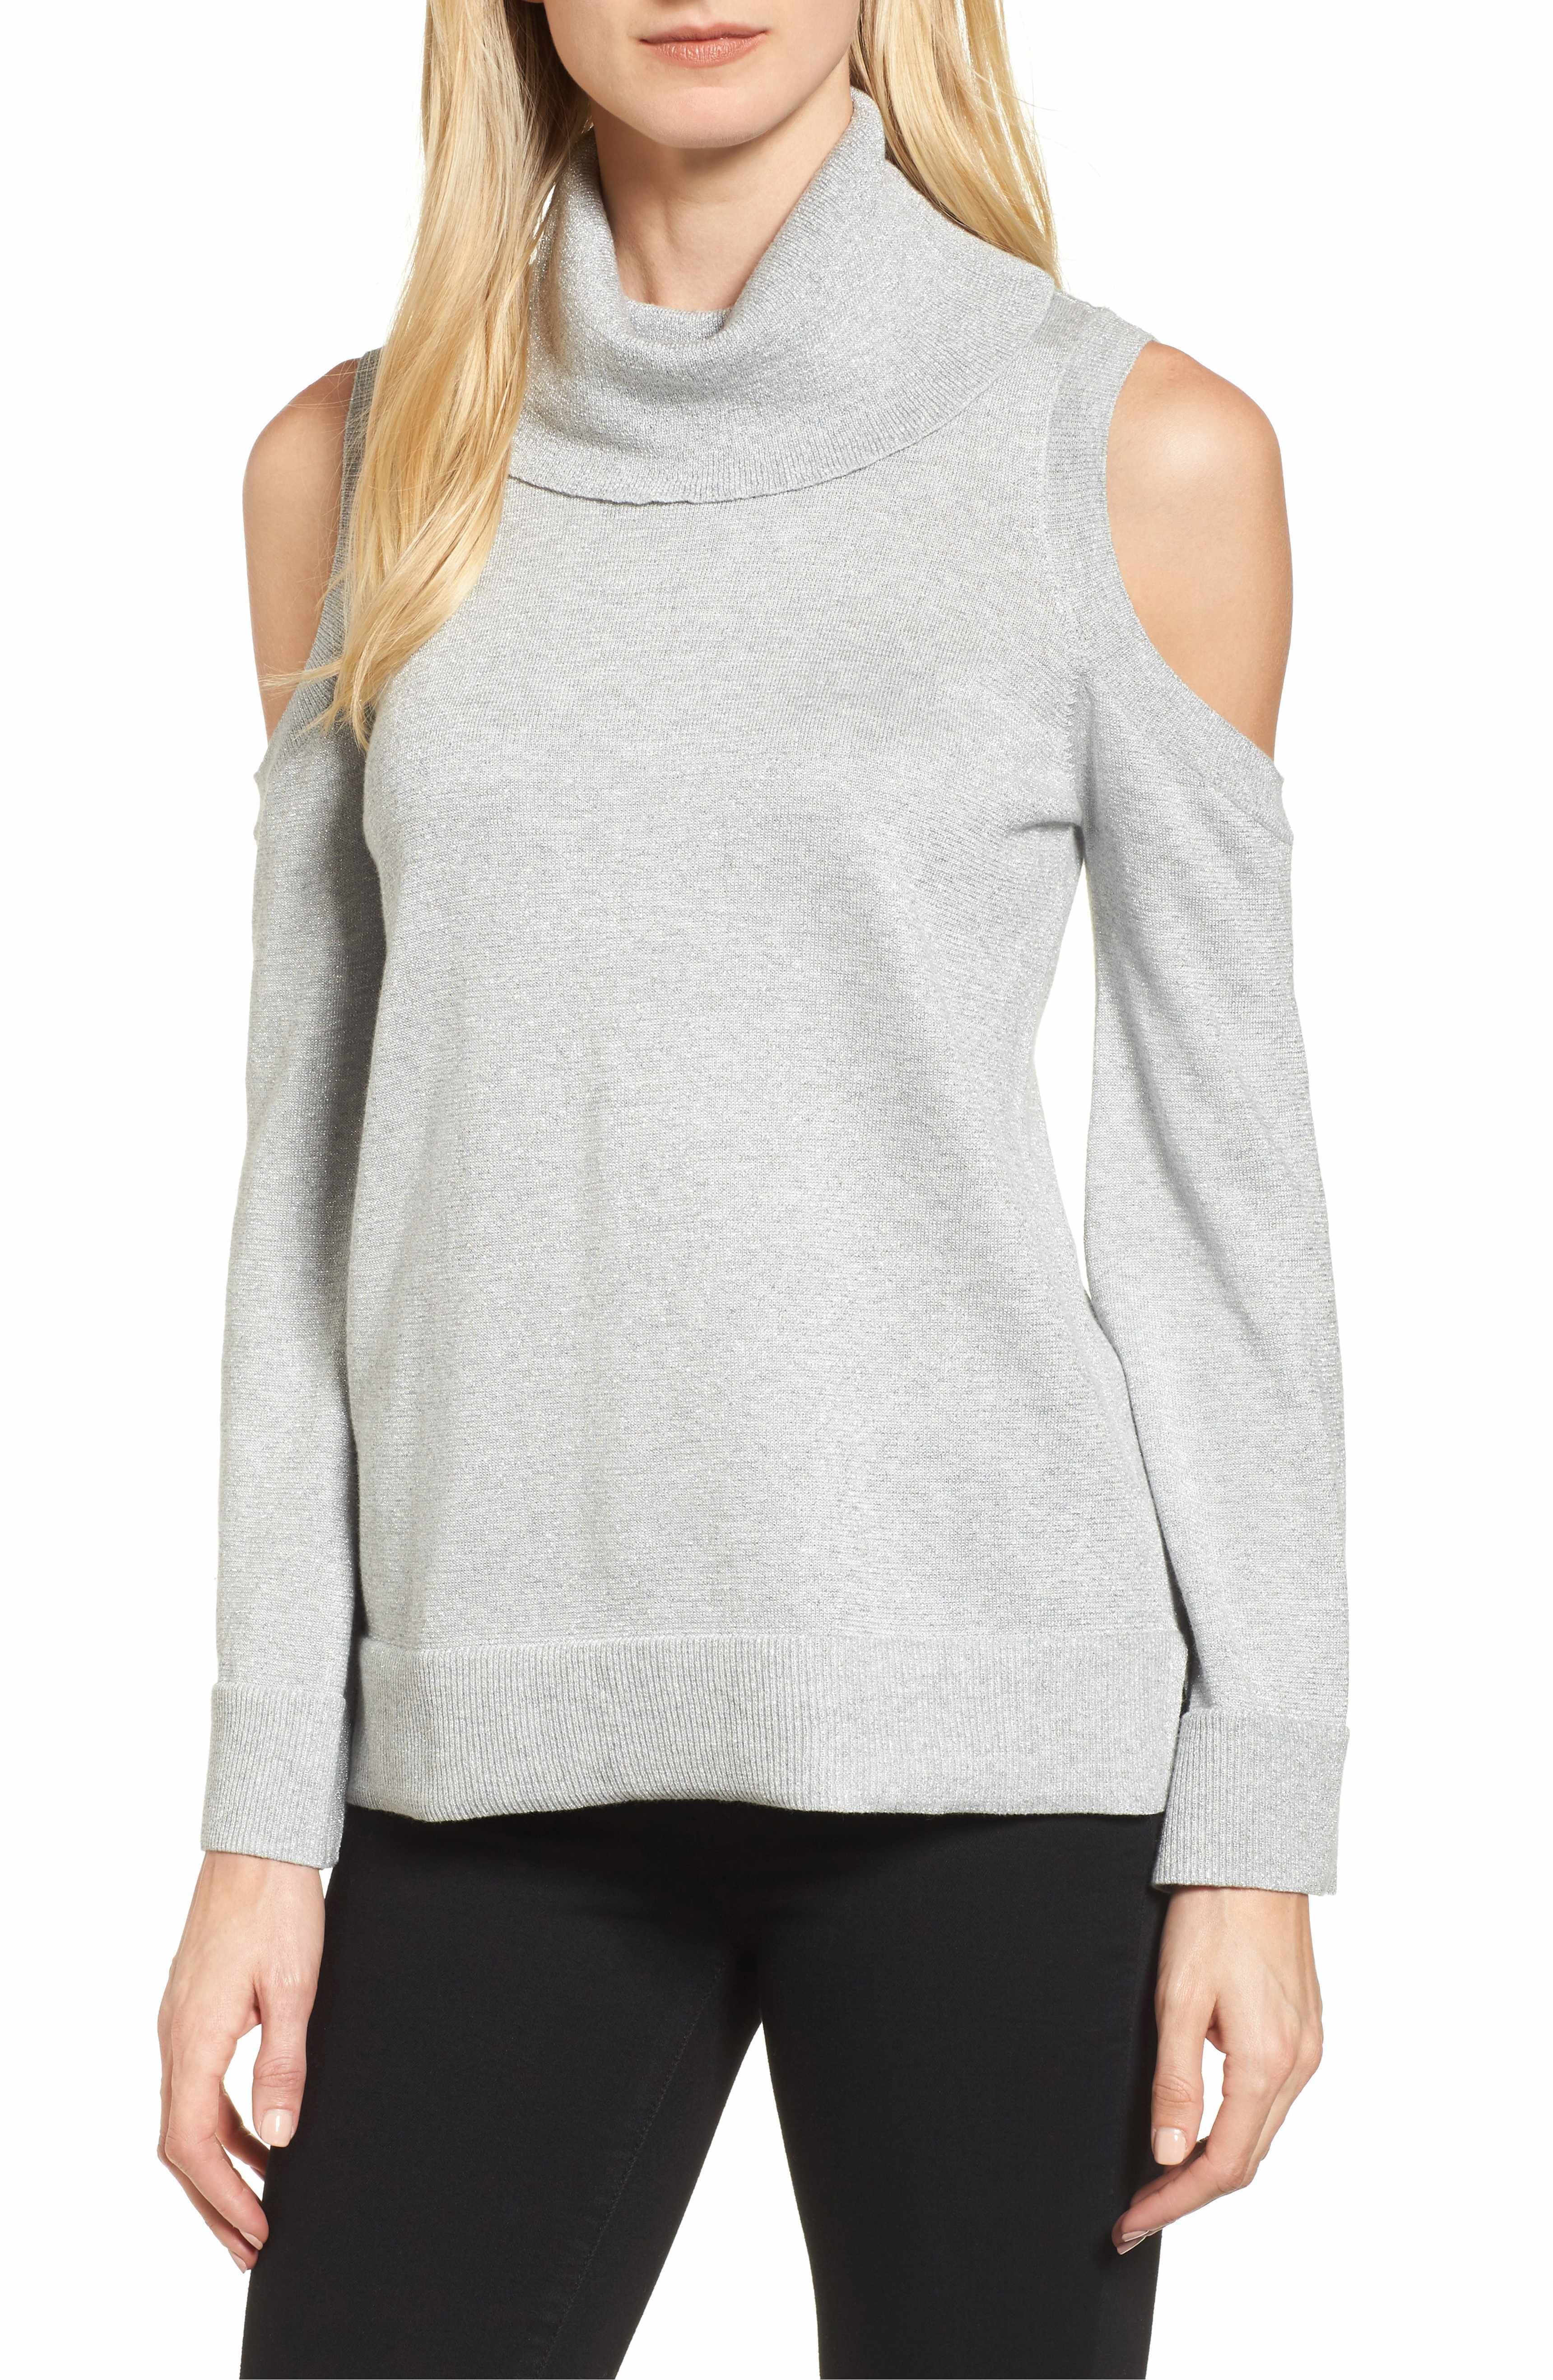 Metallic Cold Shoulder Cowl Neck Sweater | Cowl neck, Cold ...